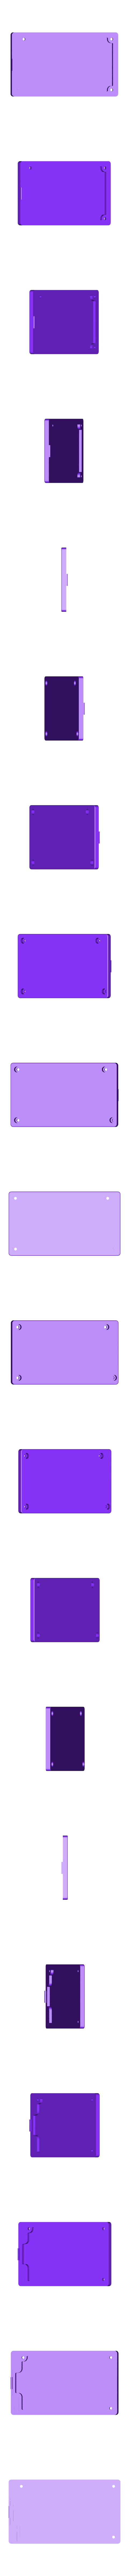 AtmelICE1-bot.stl Download free STL file Enclosure ( box ) for ATMEL  programmer ATATMEL ICE PCBA  DEBUGGER,  ARM & AVR, PCBA KIT • 3D printable template, glassy